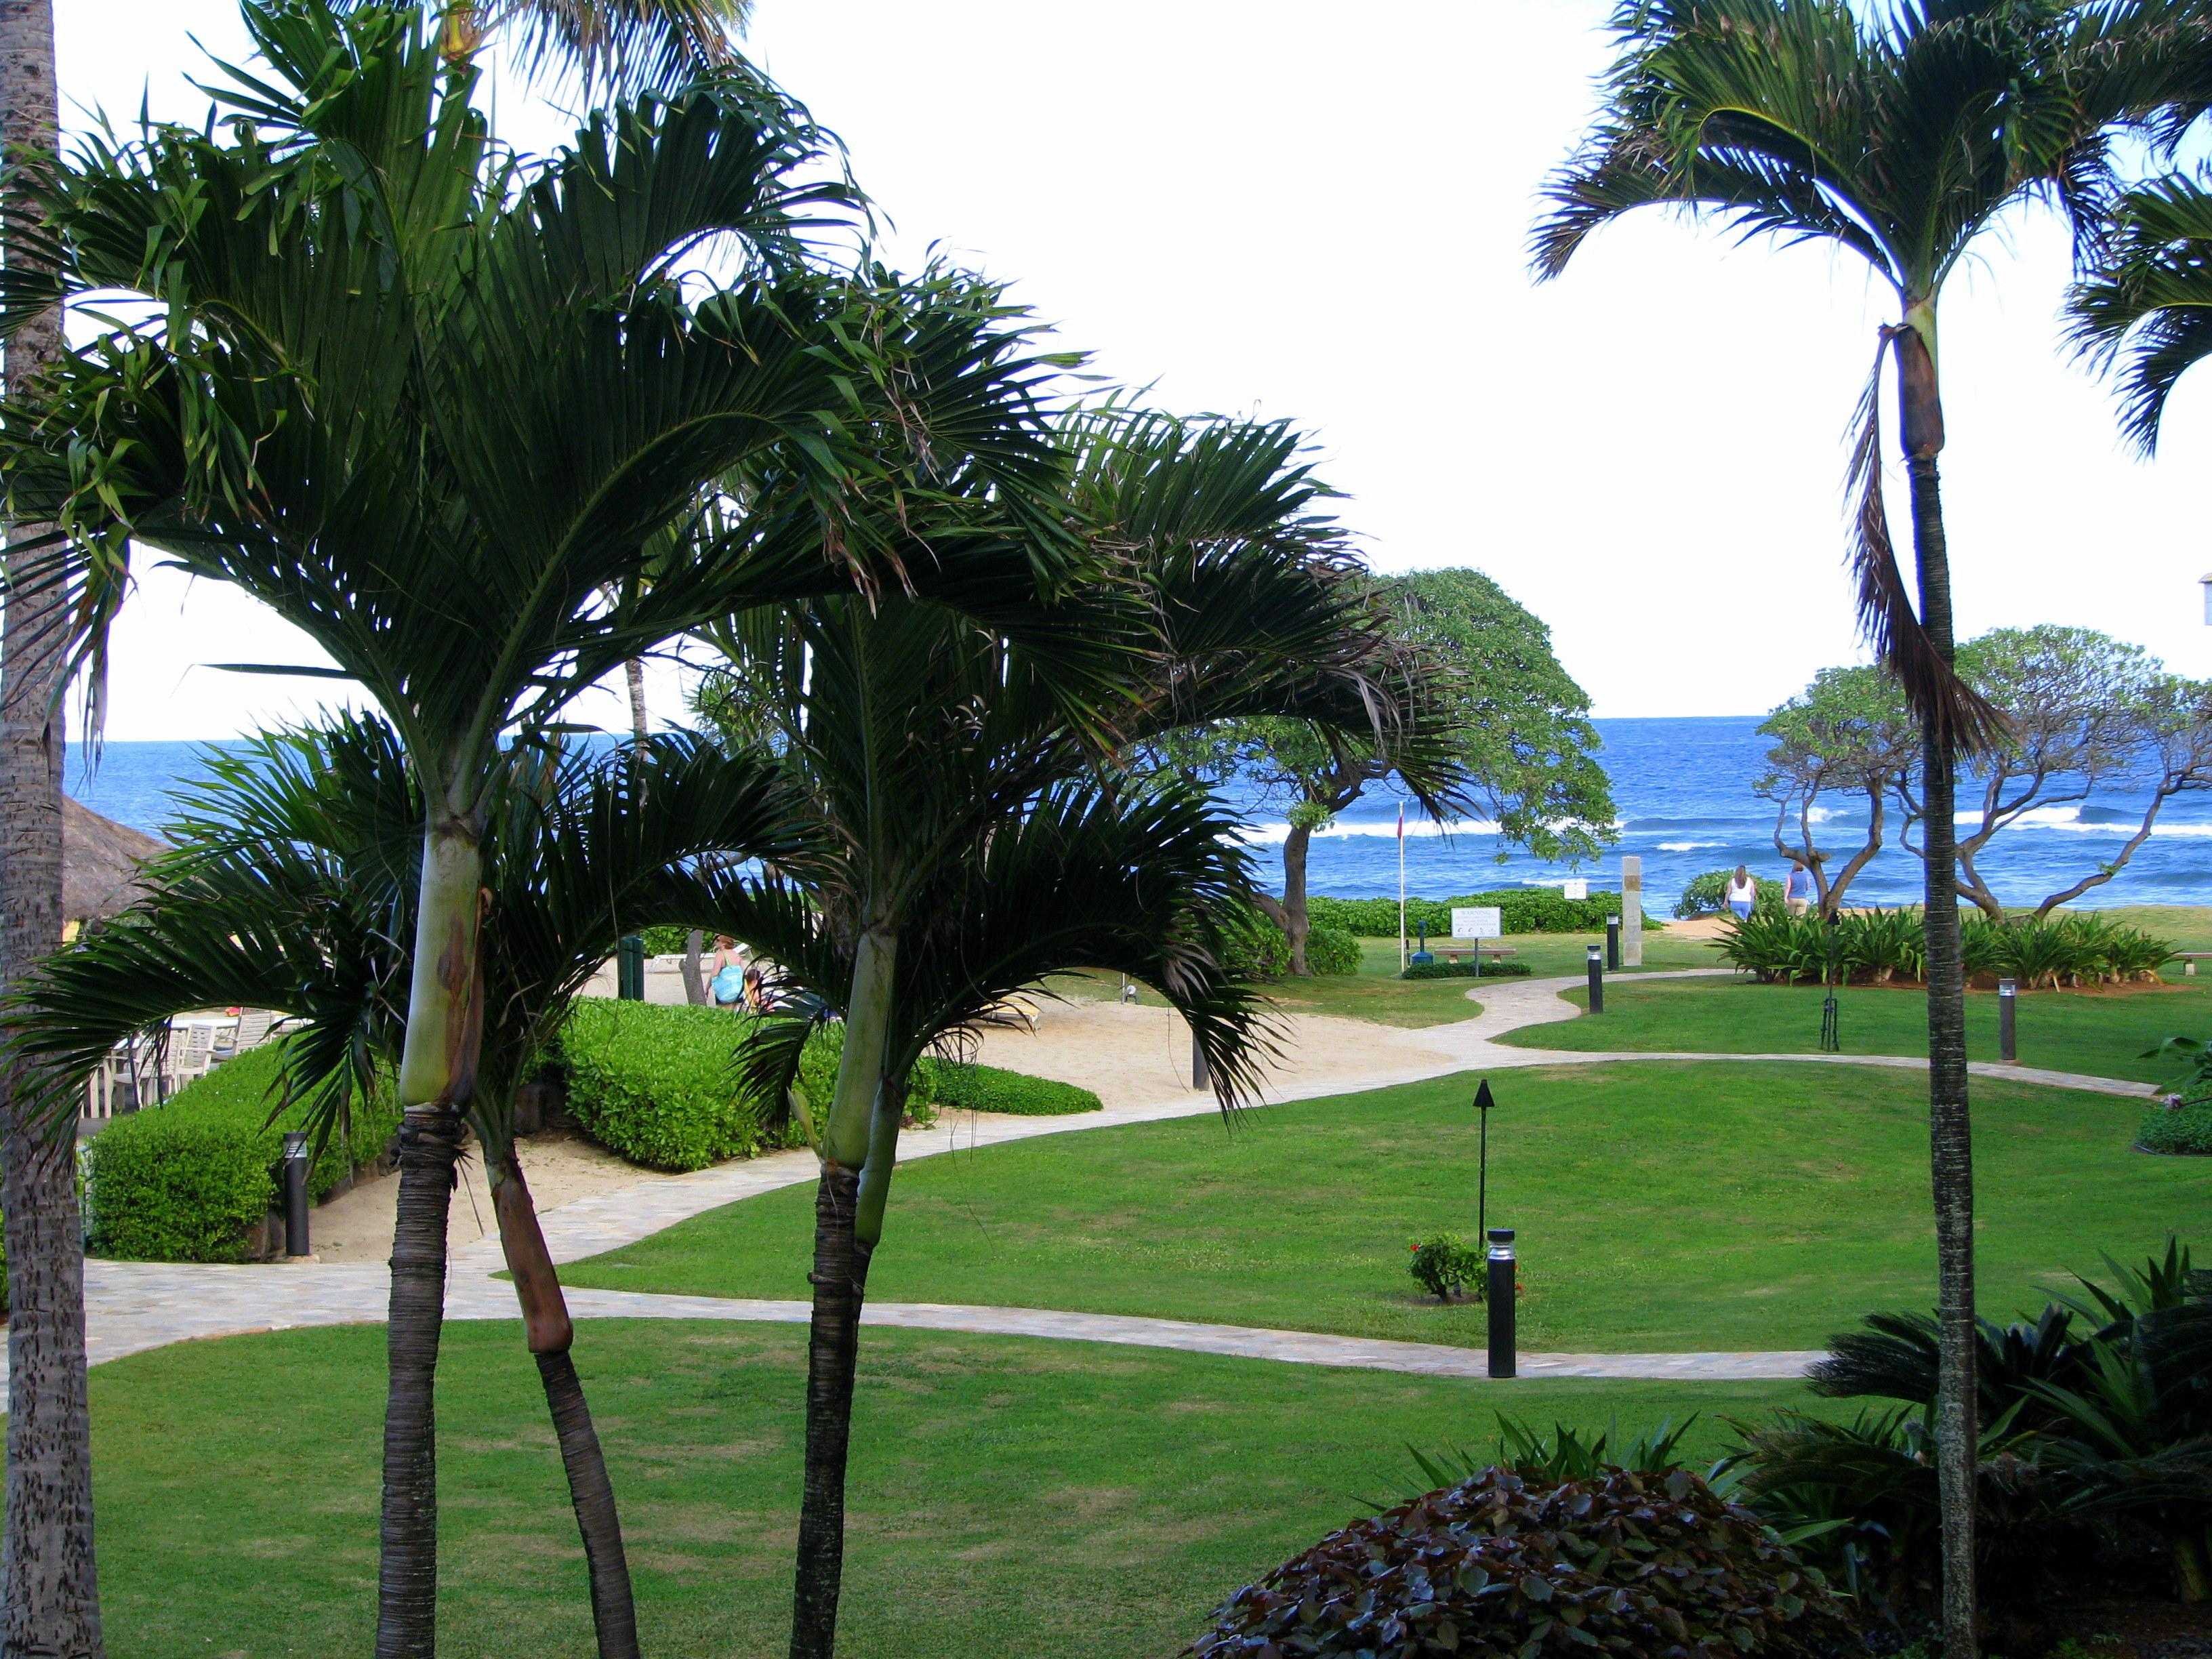 File:Hilton Kauai Beach Resort Coutyard (3294661358).jpg - Wikimedia ...